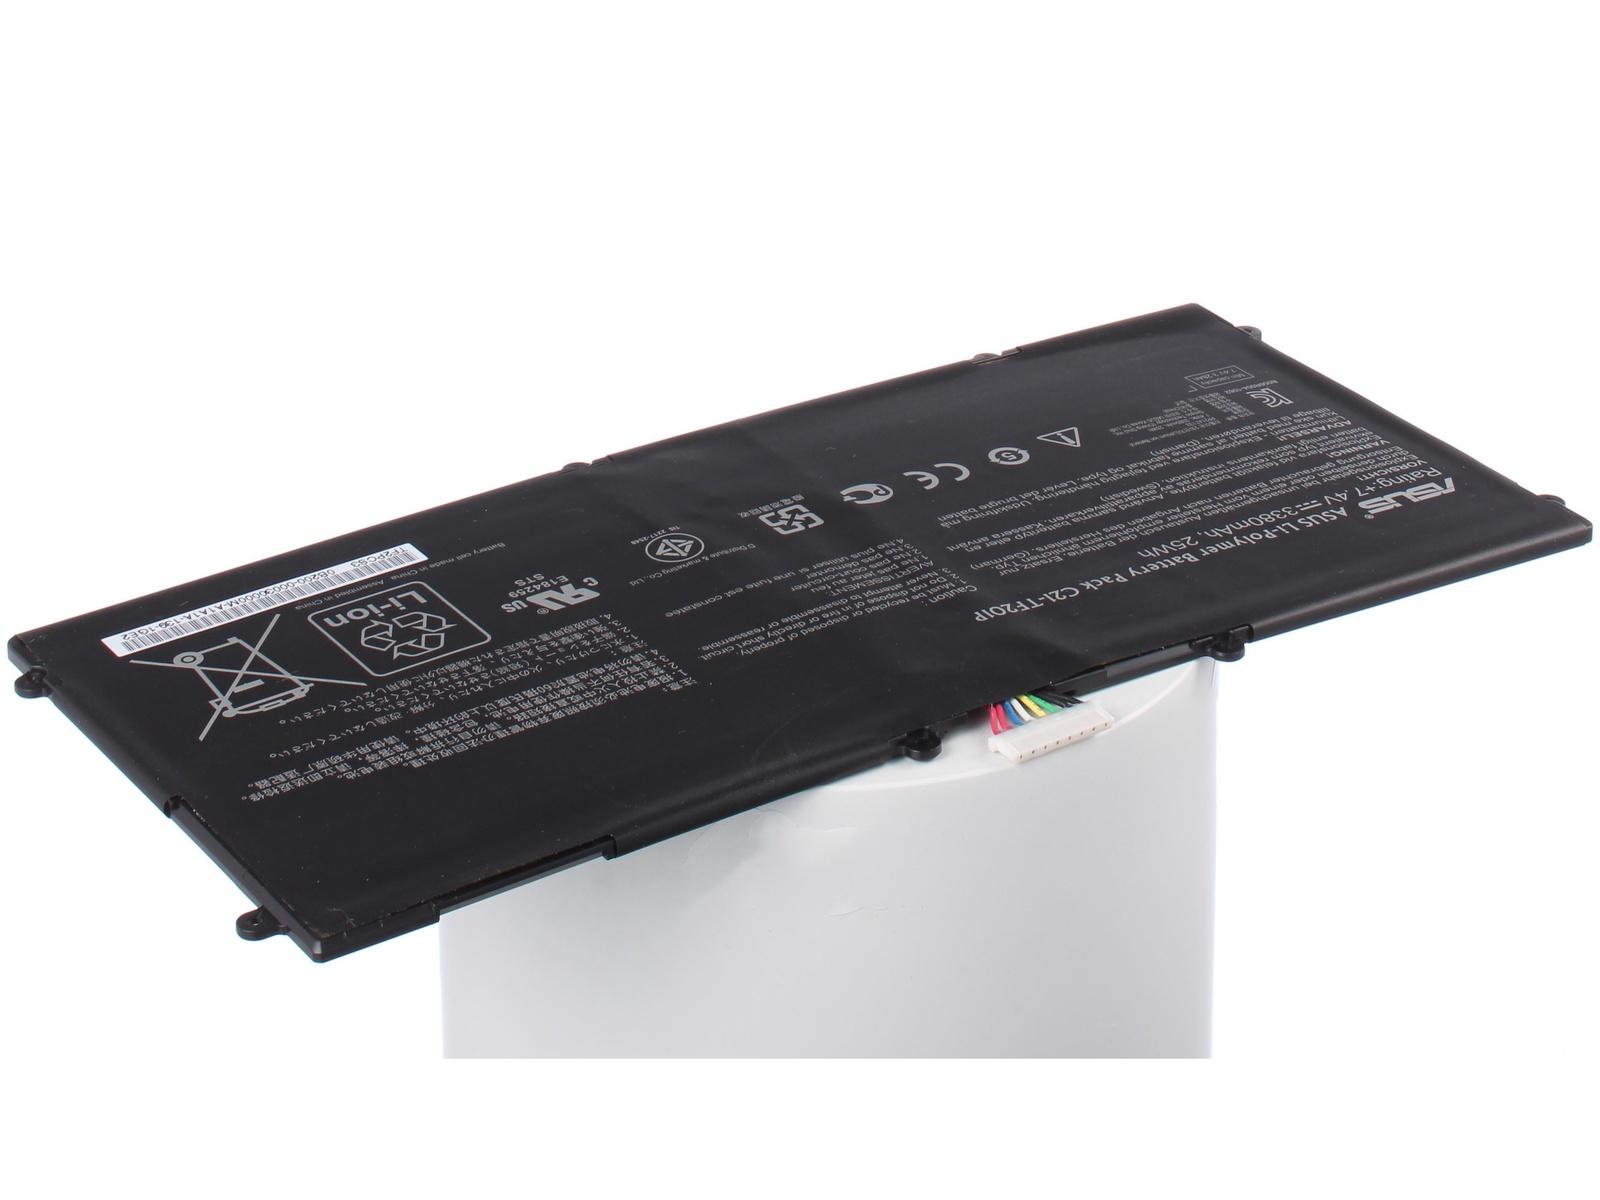 Аккумуляторная батарея iBatt iB-A1-A658 3380mAh для ноутбуков Asus аккумуляторная батарея topon top f5 6600мач для ноутбуков asus f5m f5n f5sr f5z f5ri f5sl f5vi f5vl x5 x50c x50m x50n x50rl x50sl x50vl